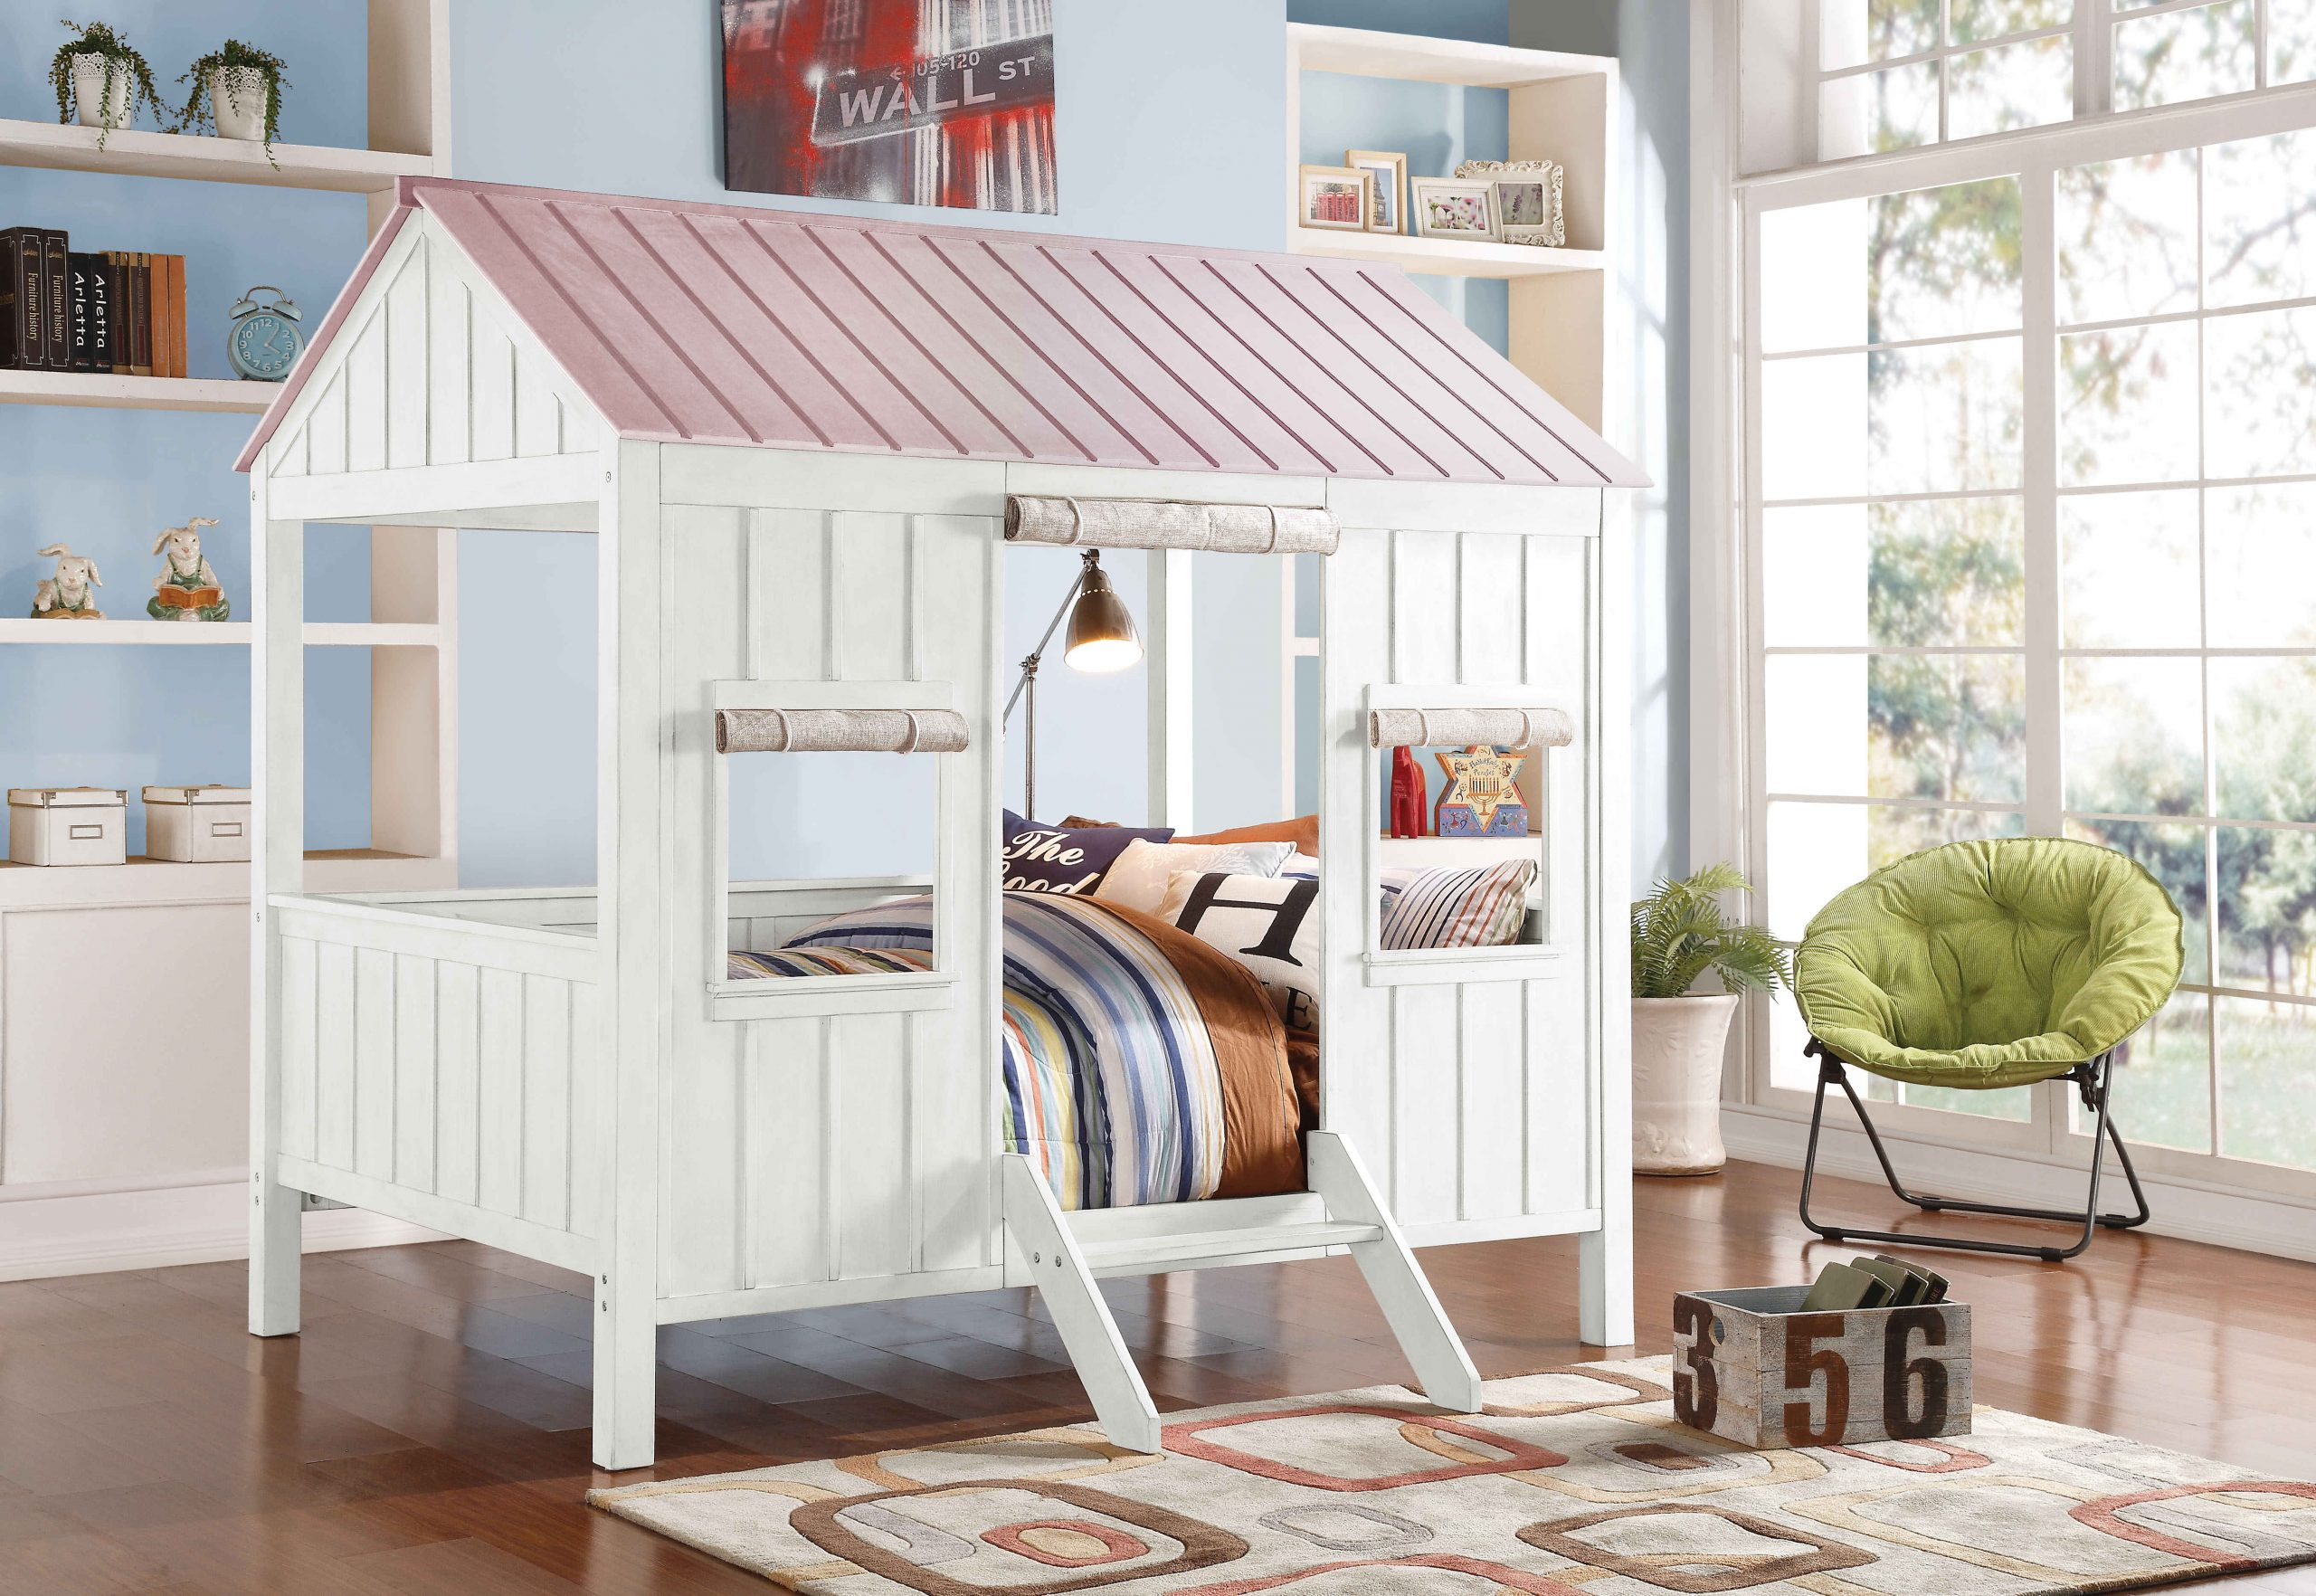 Cottage House Bed Full Size - kidsroom.vip